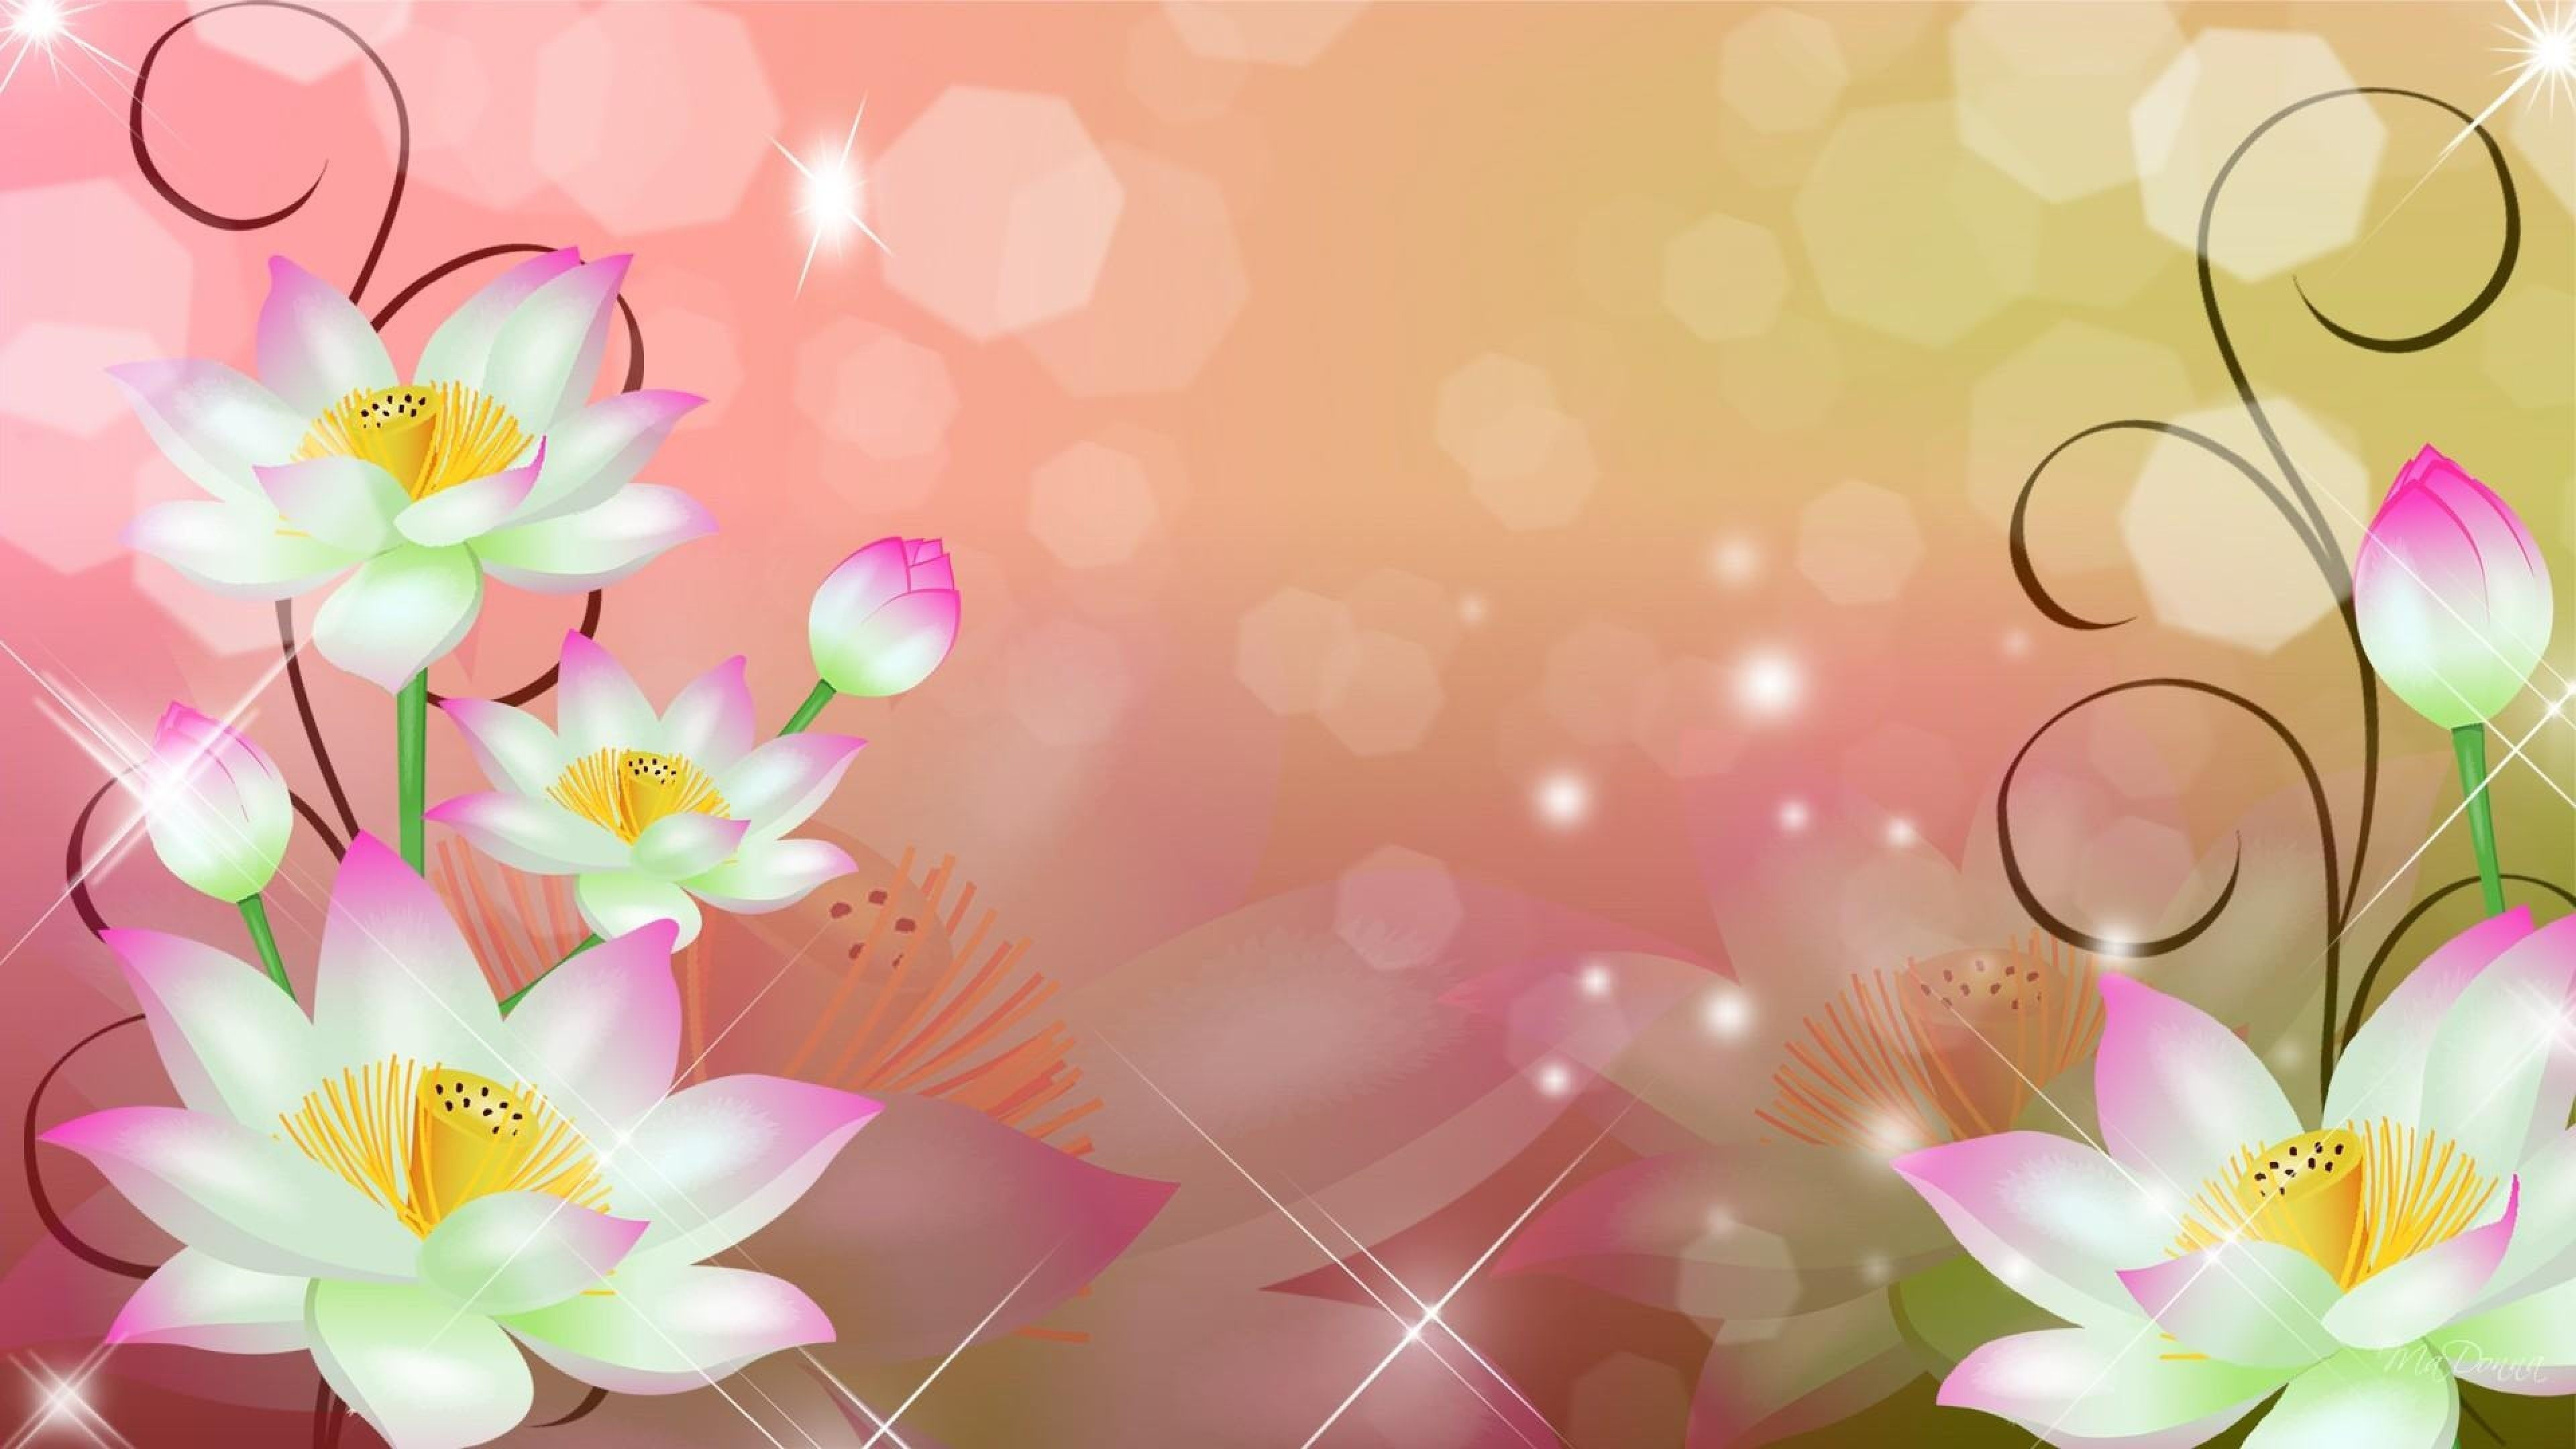 The Lotus Flower Art 4k Ultra Hd Wallpaper Ololoshenka In 2019